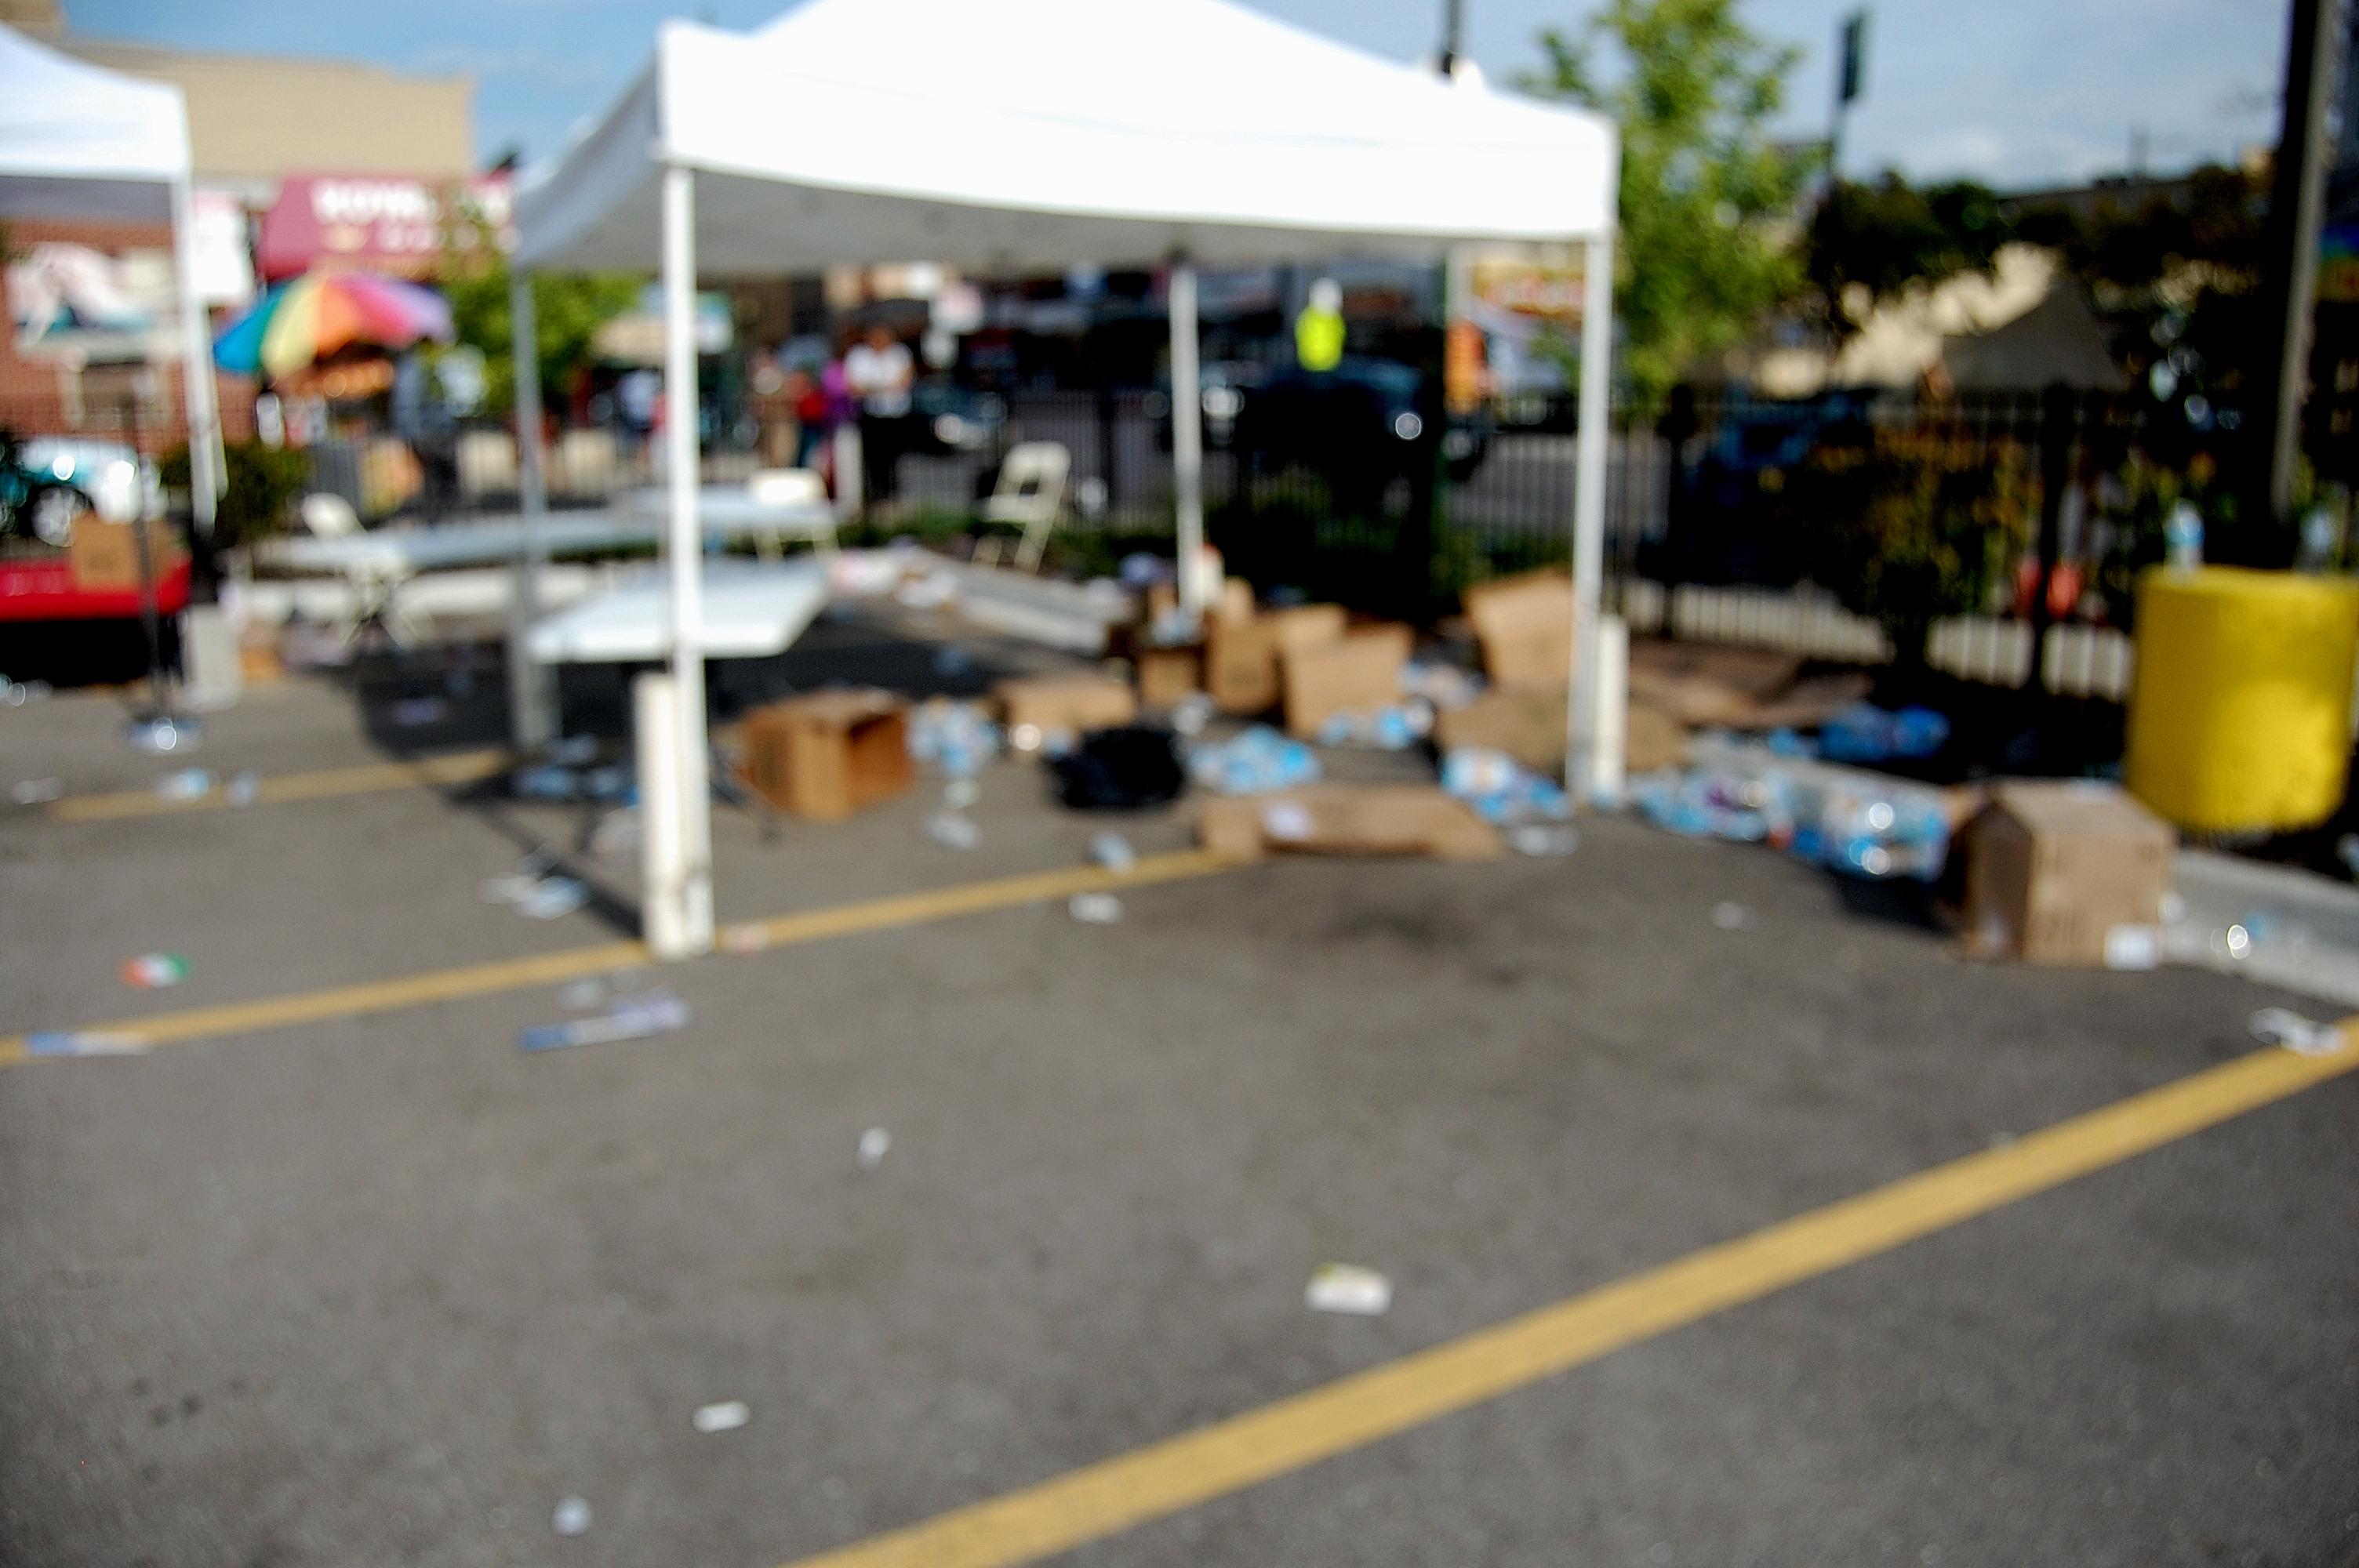 str8 parking lot dumpster dude